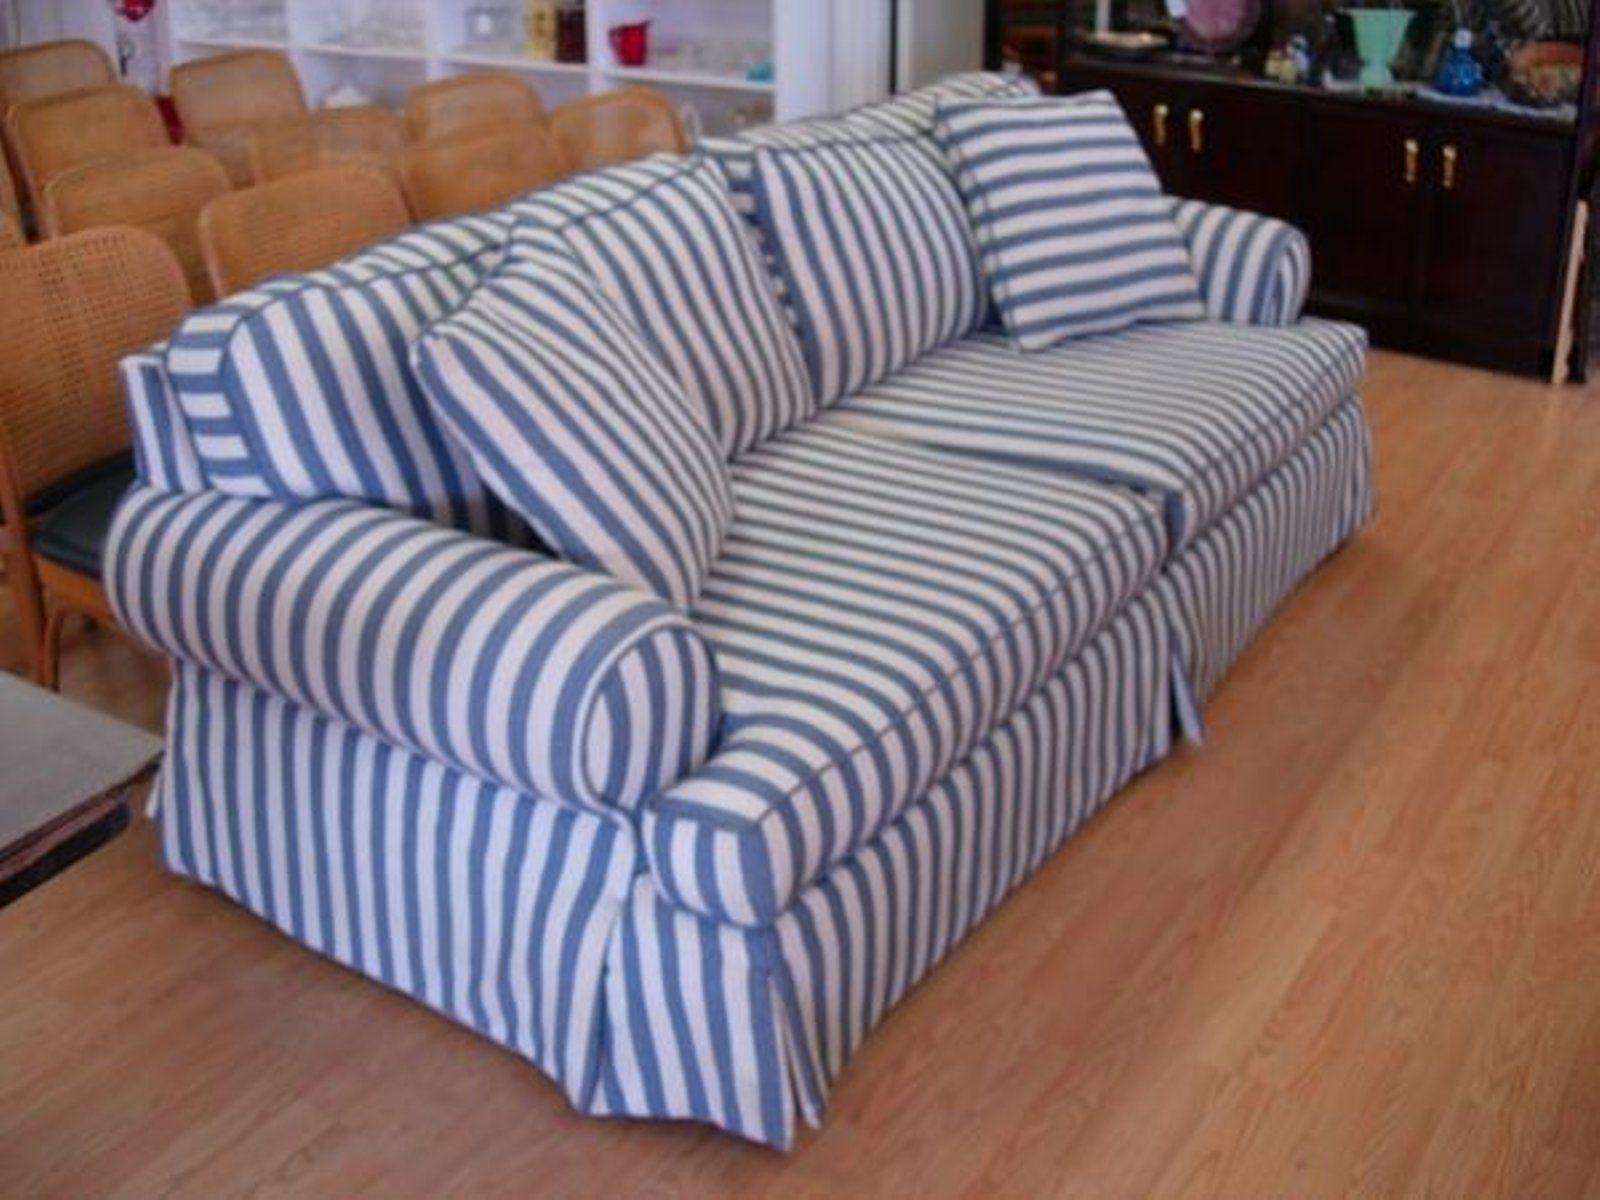 11278 Modern Sofa Blue White Striped Cotton Denim Comf On